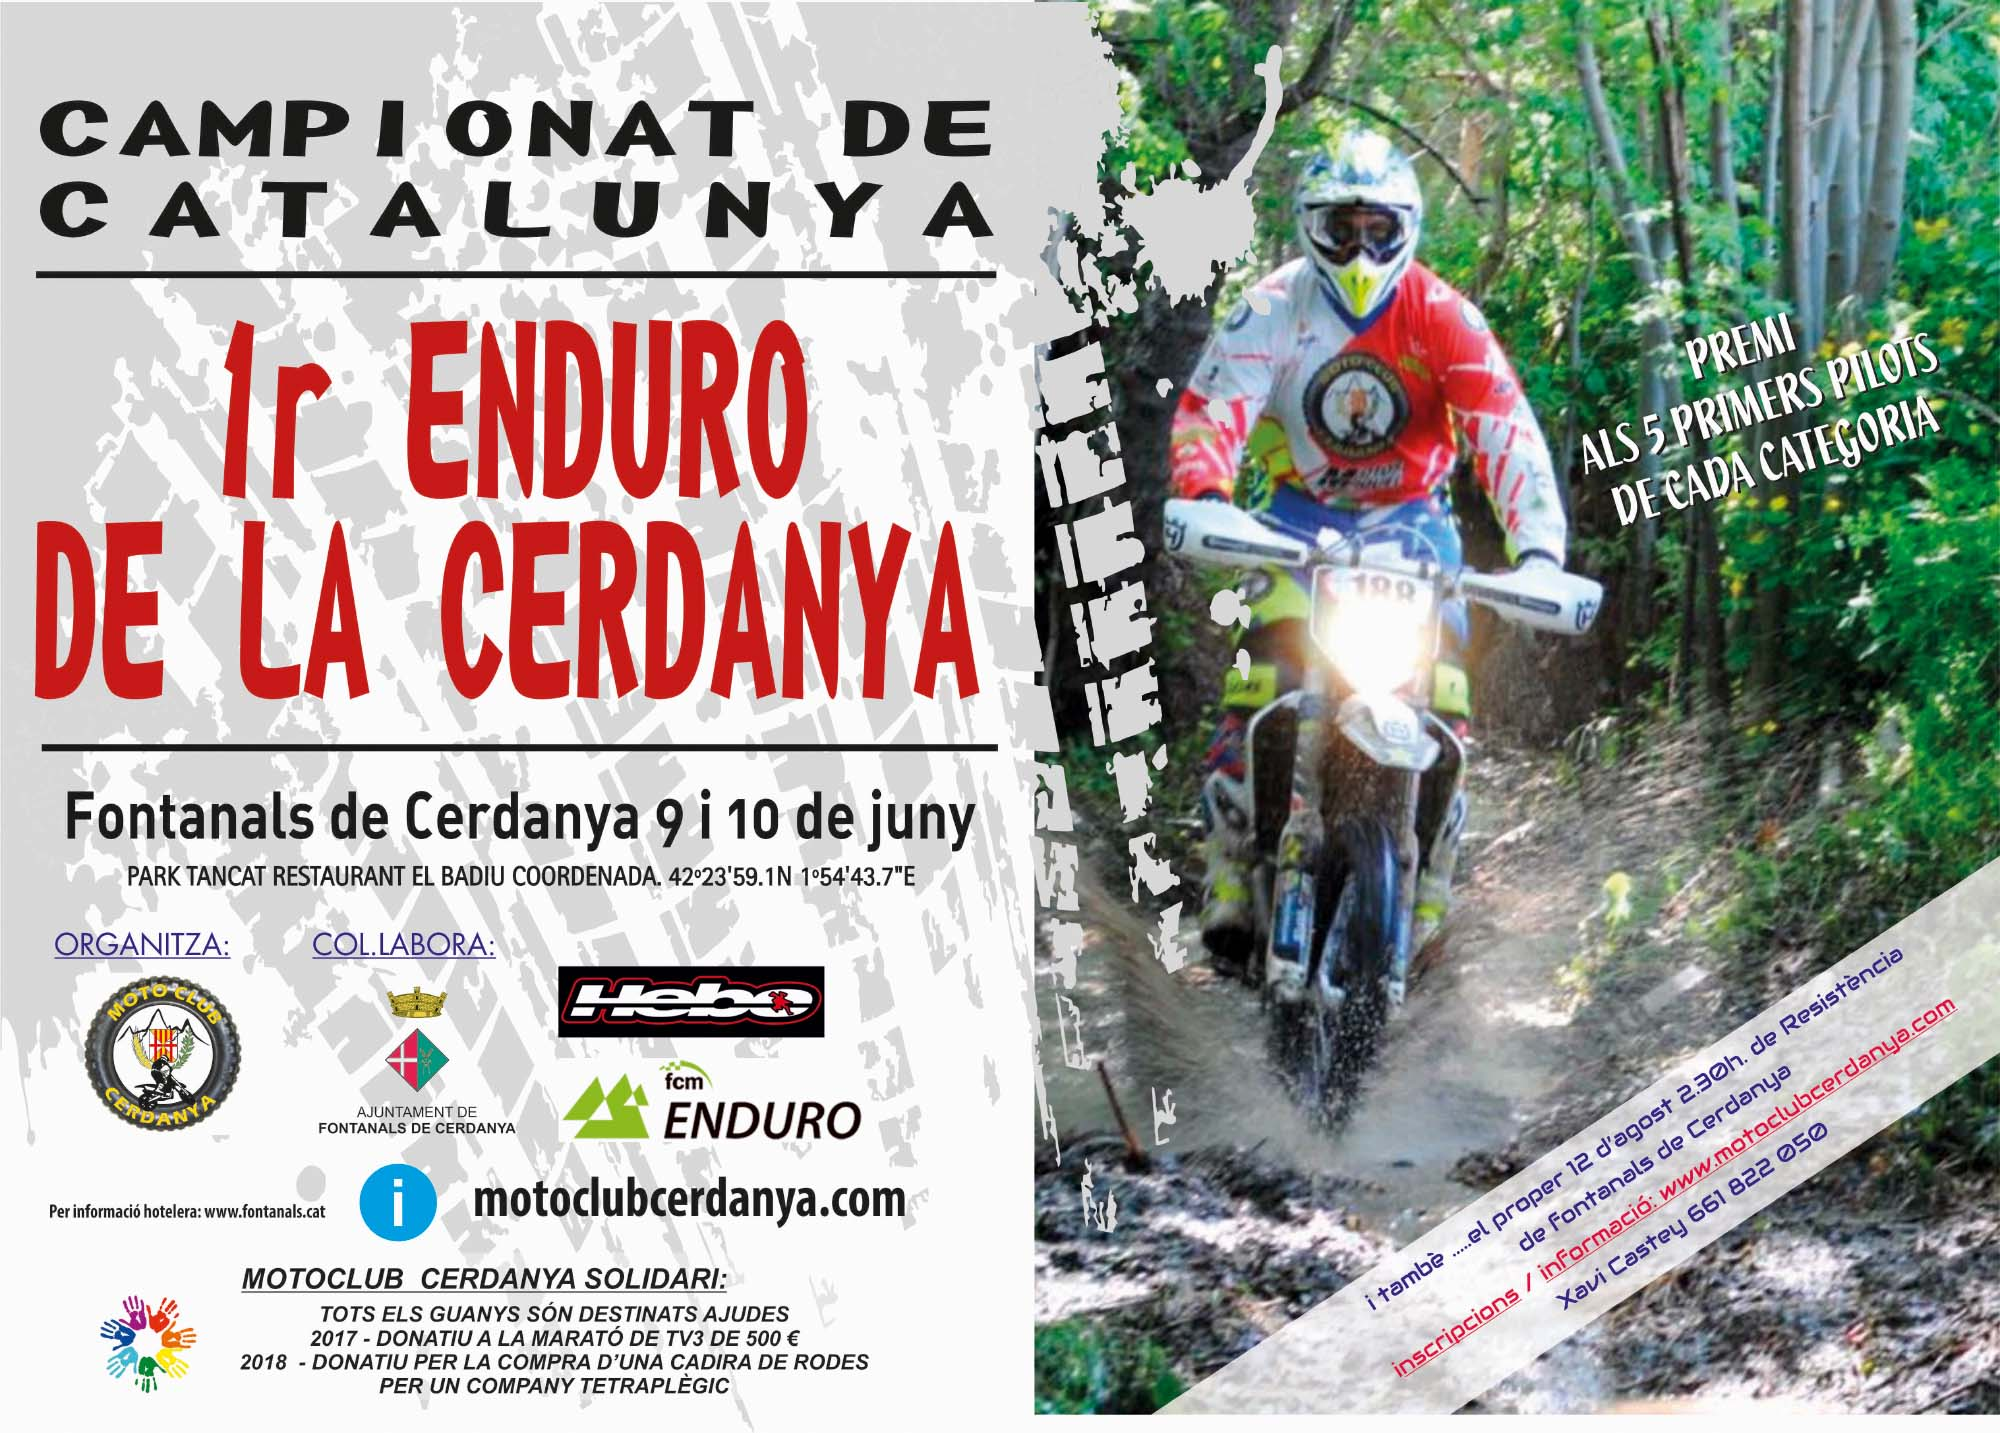 Enduro Campionat Catalunya Cerdanya